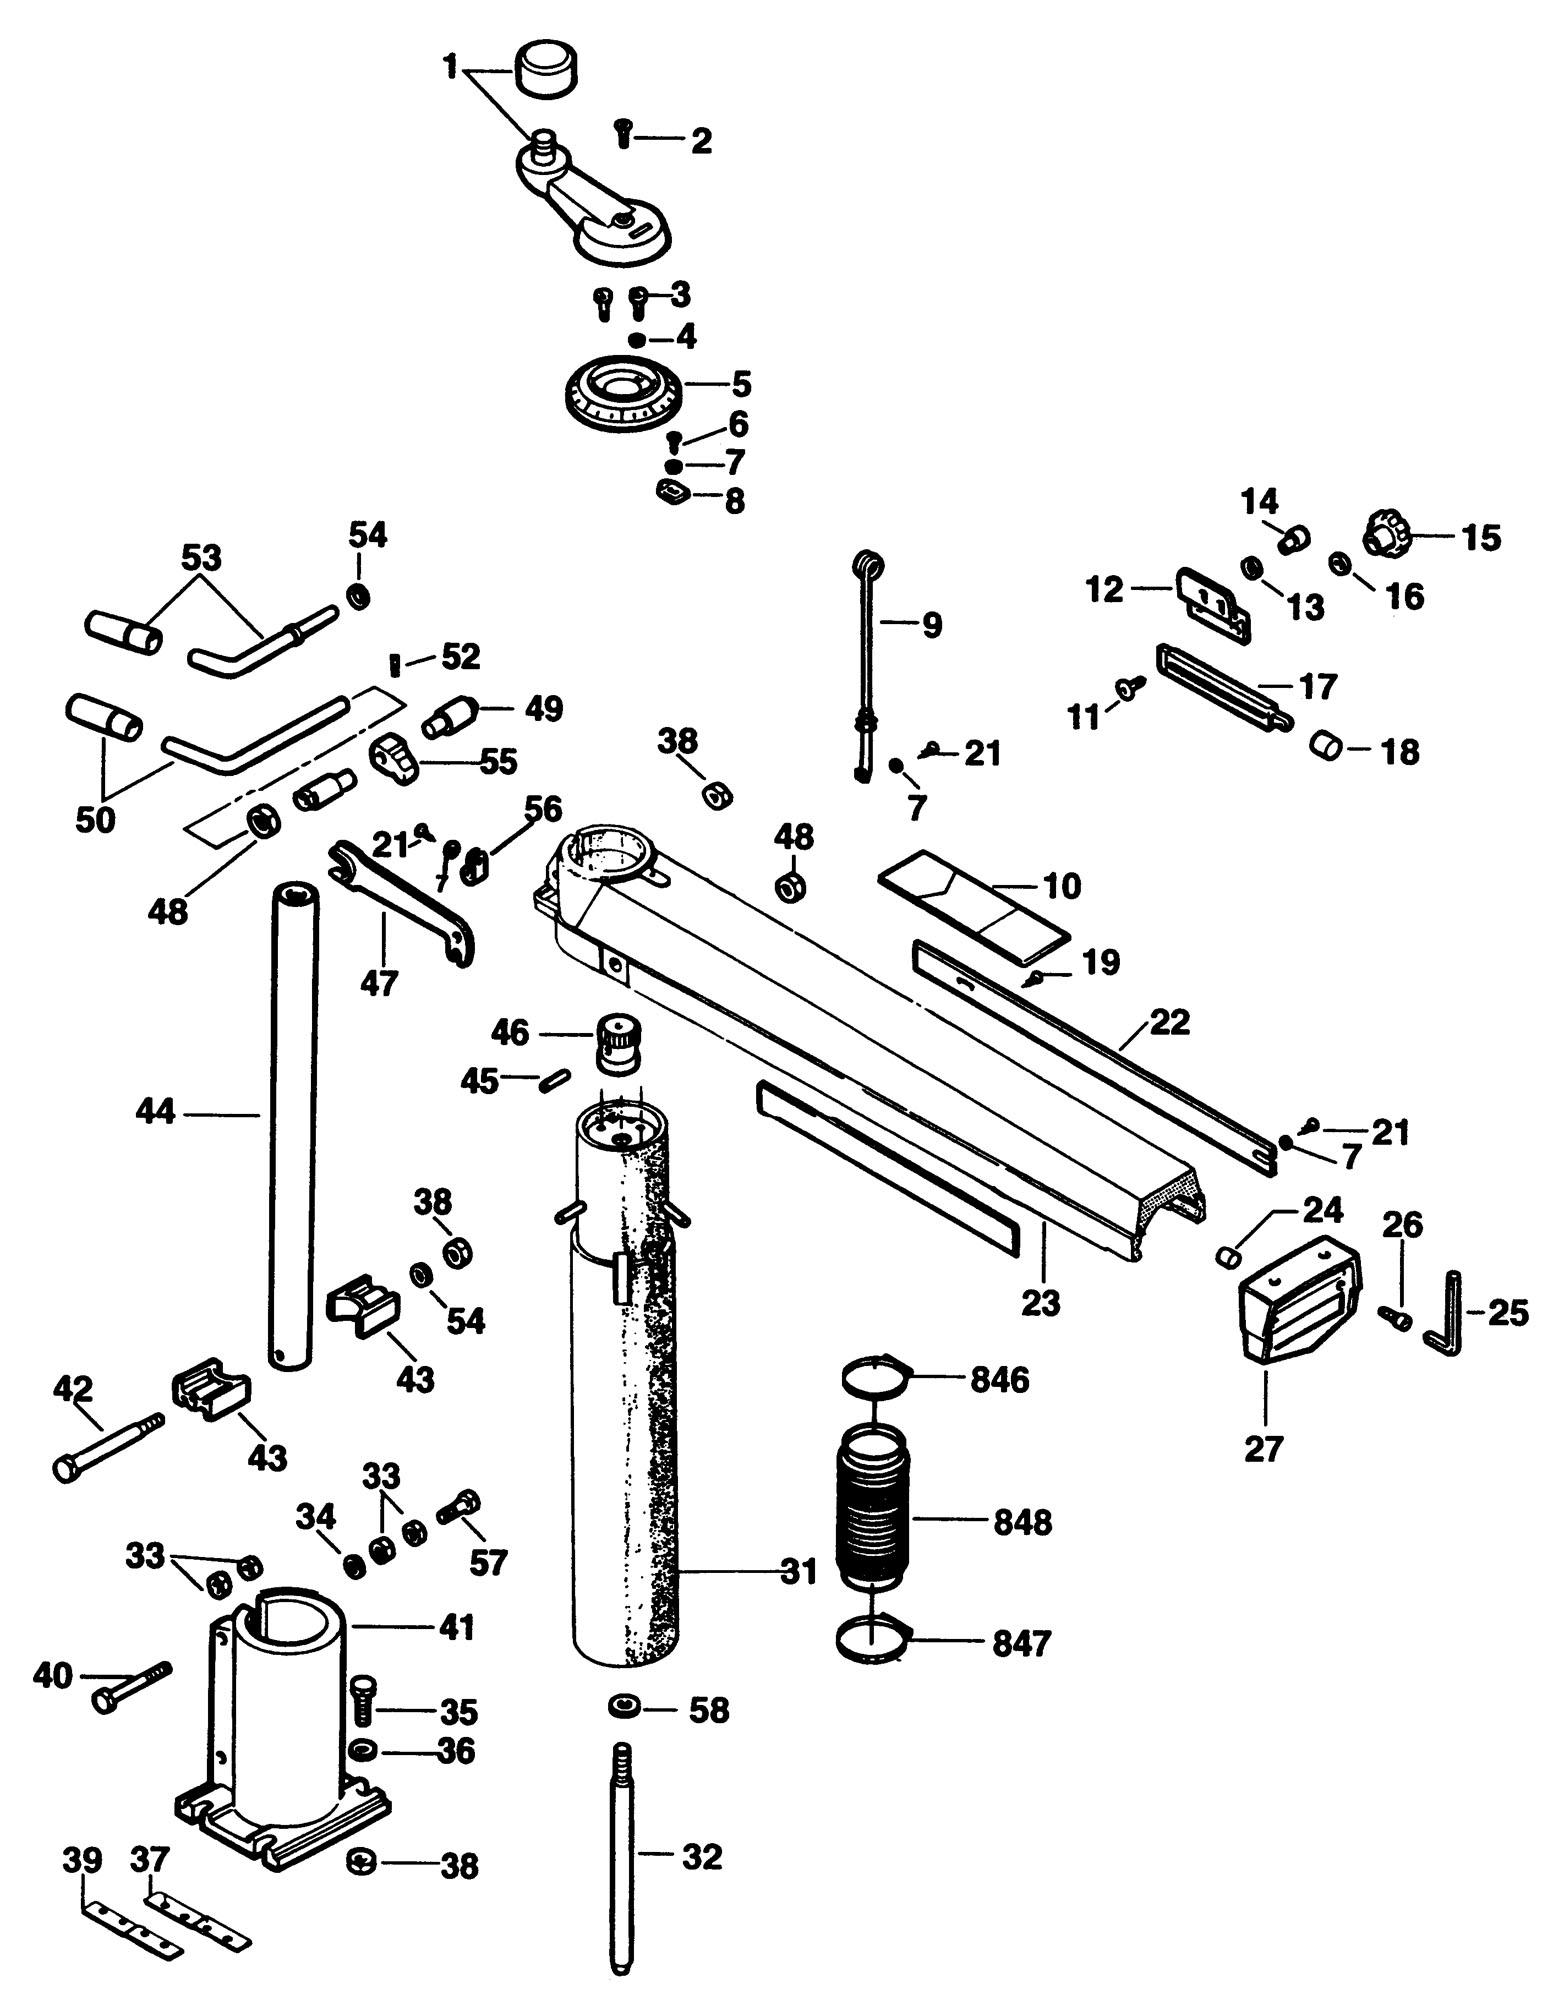 spares for dewalt dw1751 a radial arm saw  type 1 dewalt 770 radial arm saw parts list De Walt Radial Arm Saw Motor